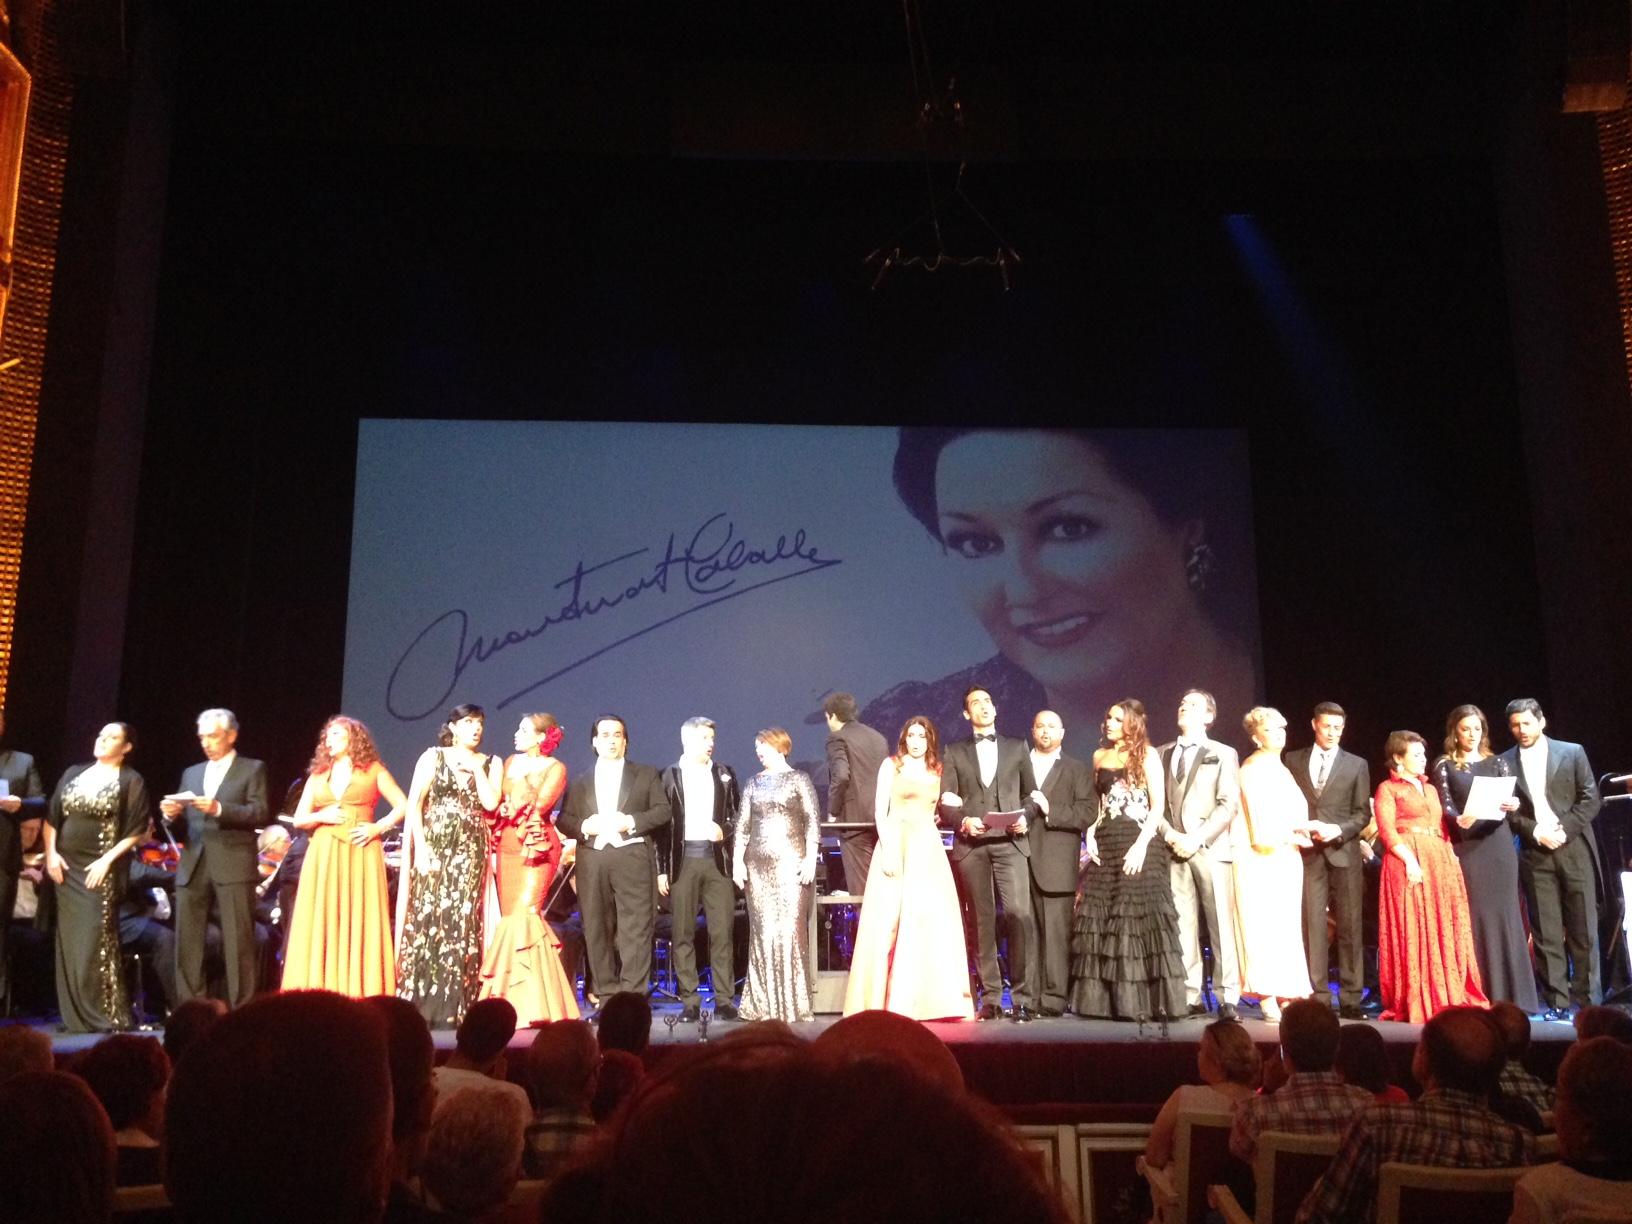 Crítica: La Zarzuela rinde homenaje a Montserrat Caballé